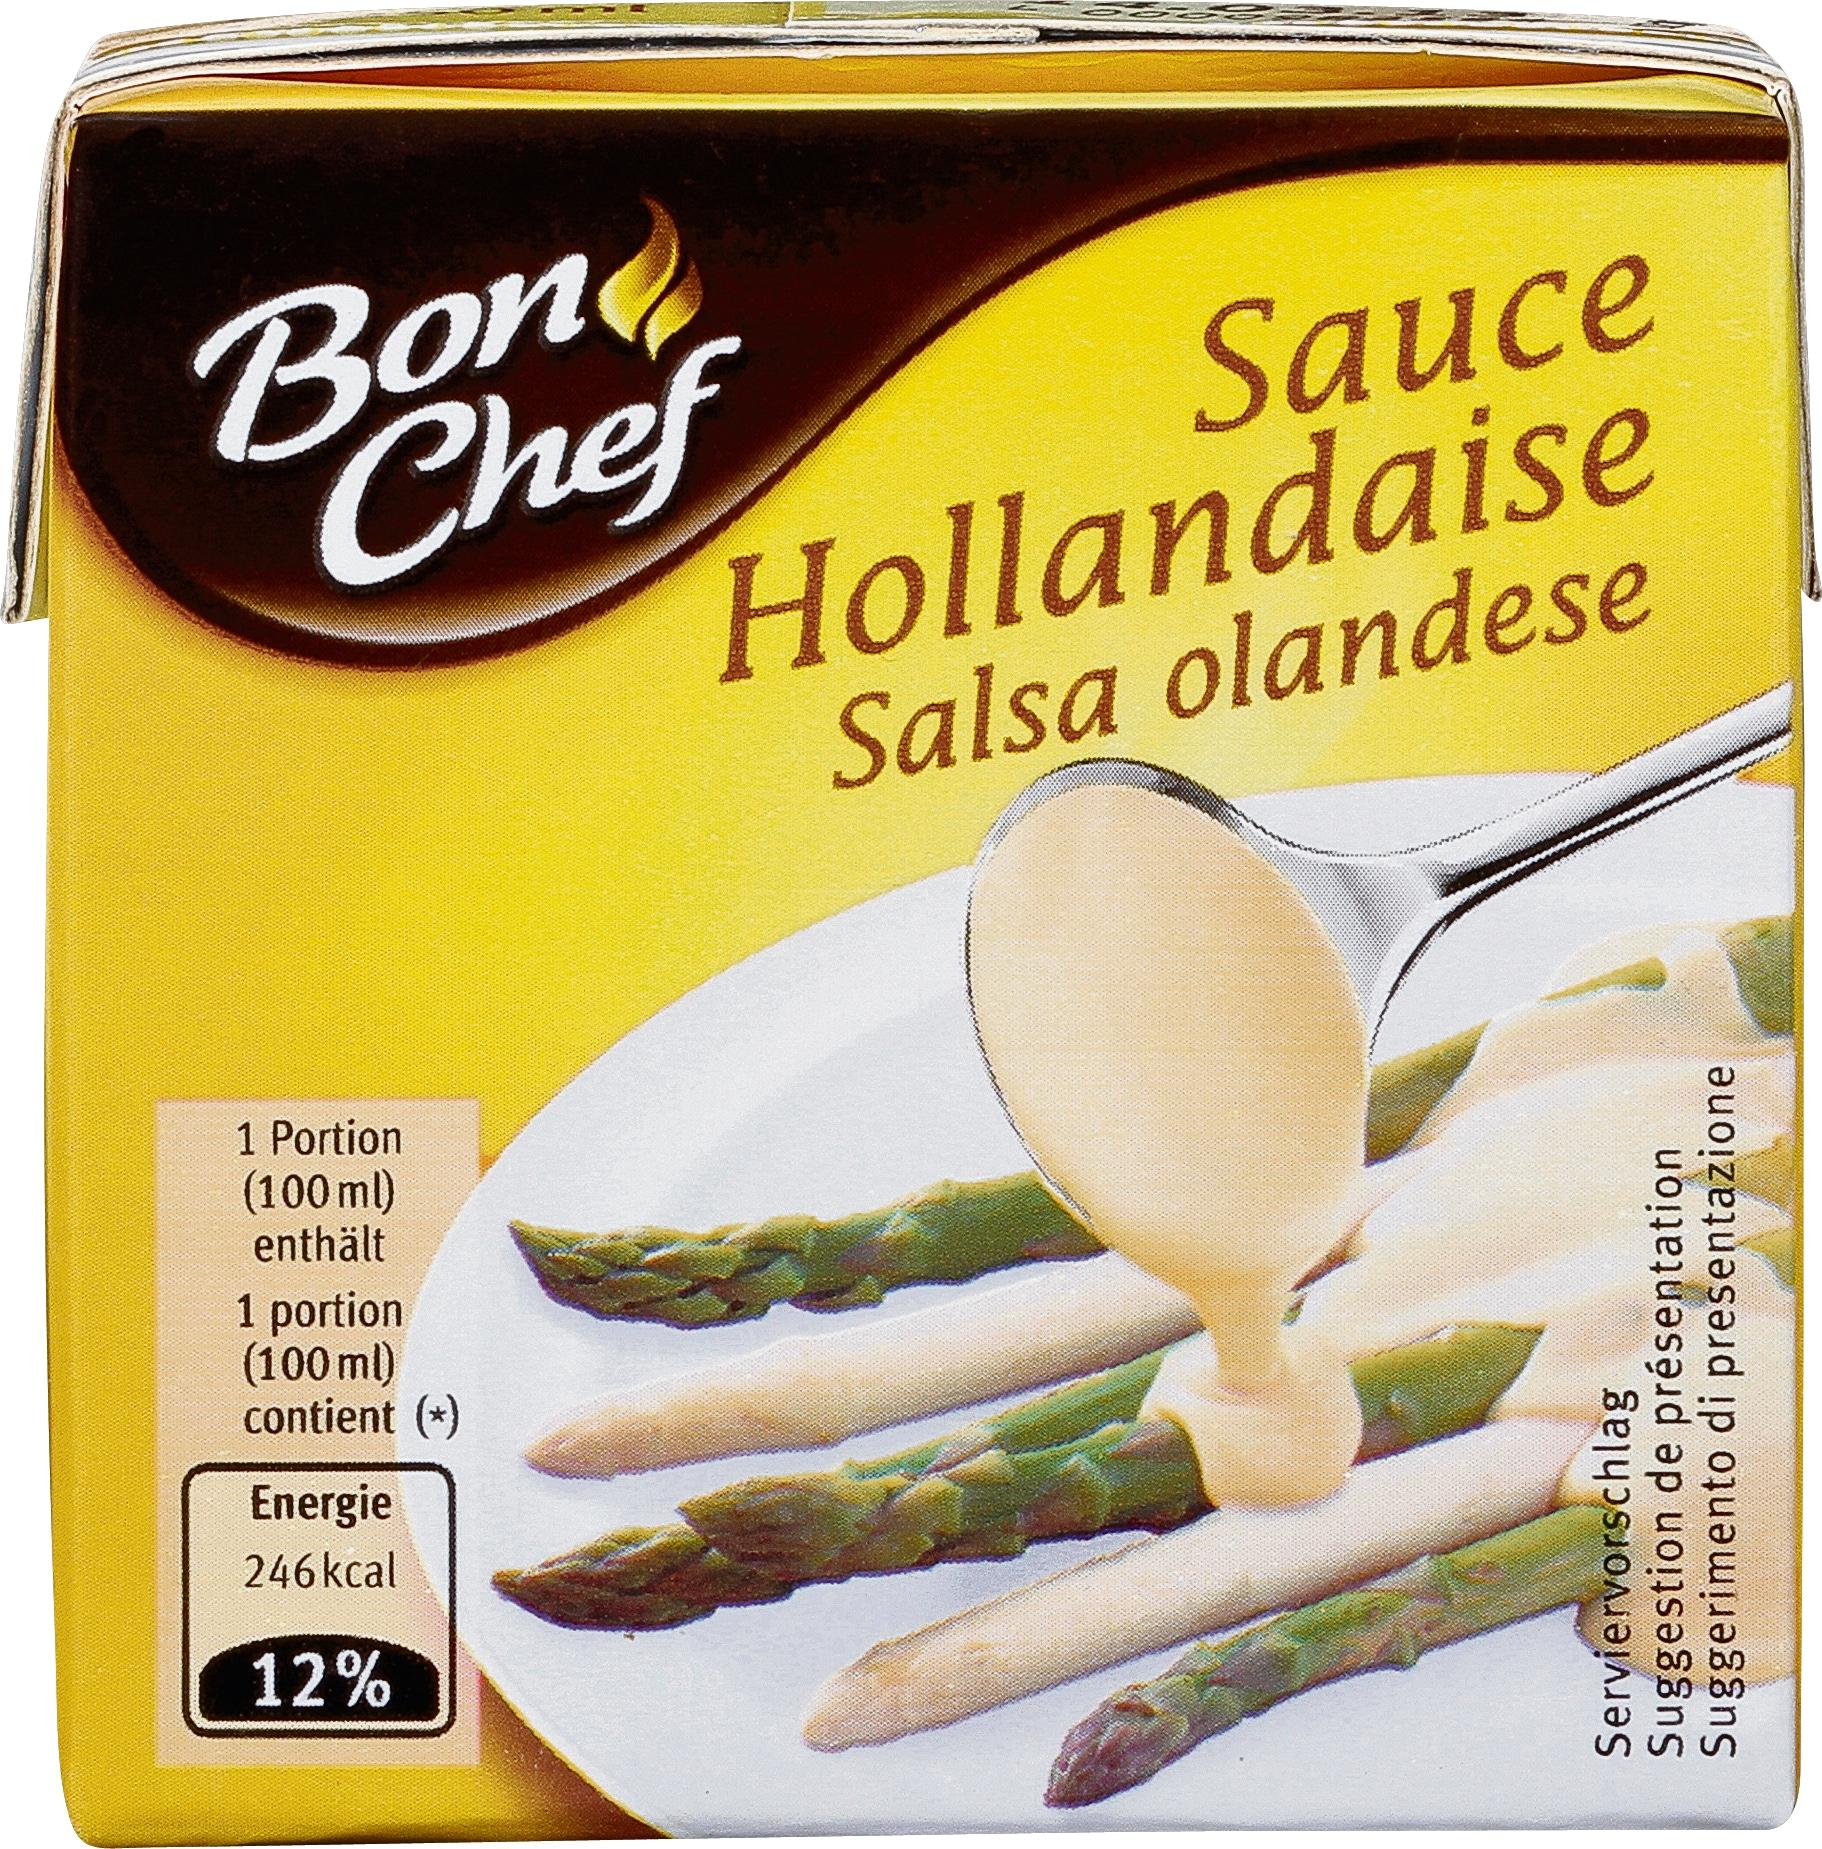 Bon Chef Sauce Hollandaise - 250g